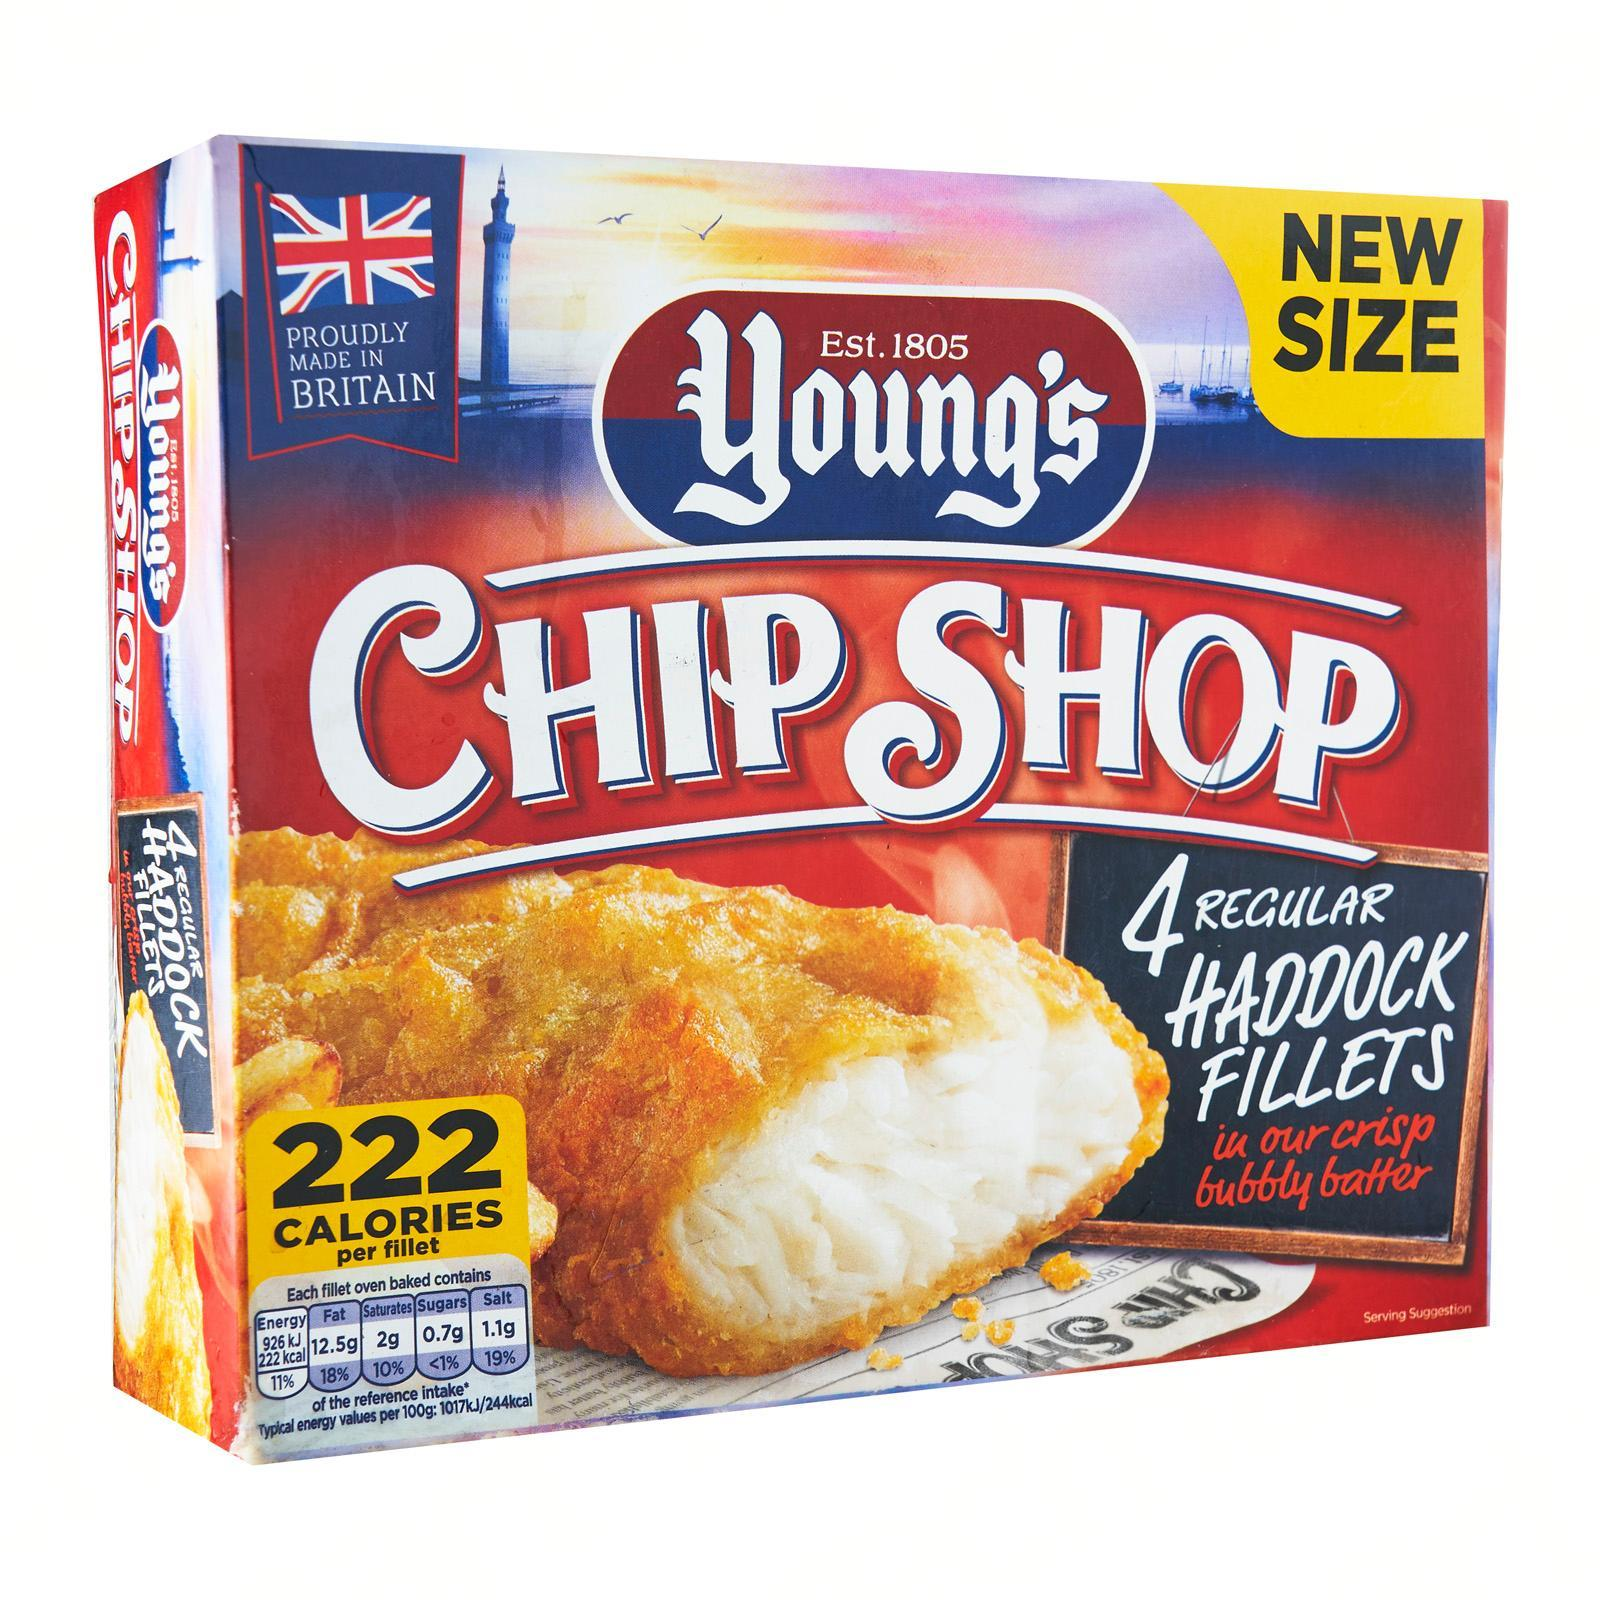 Young's Chip Shop 4 Large Crisp Bubbly Batter Haddock Fillets - Frozen